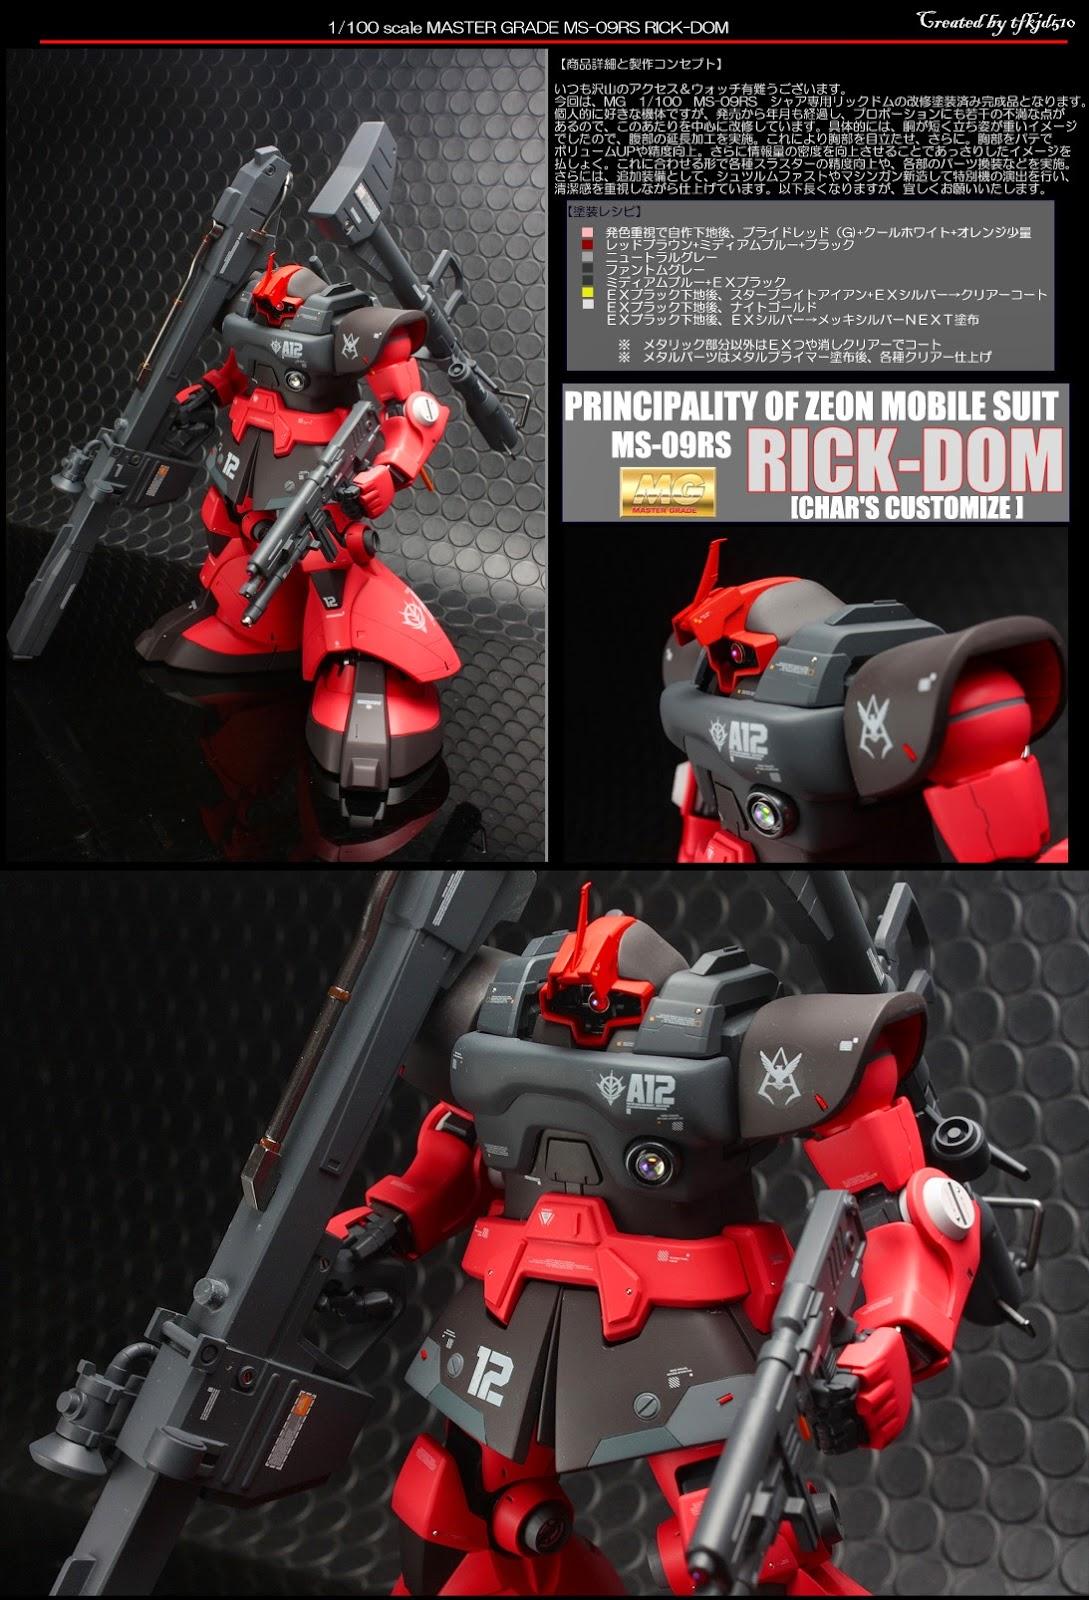 custom build  mg 1  100 ms-09rs char u0026 39 s rick dom